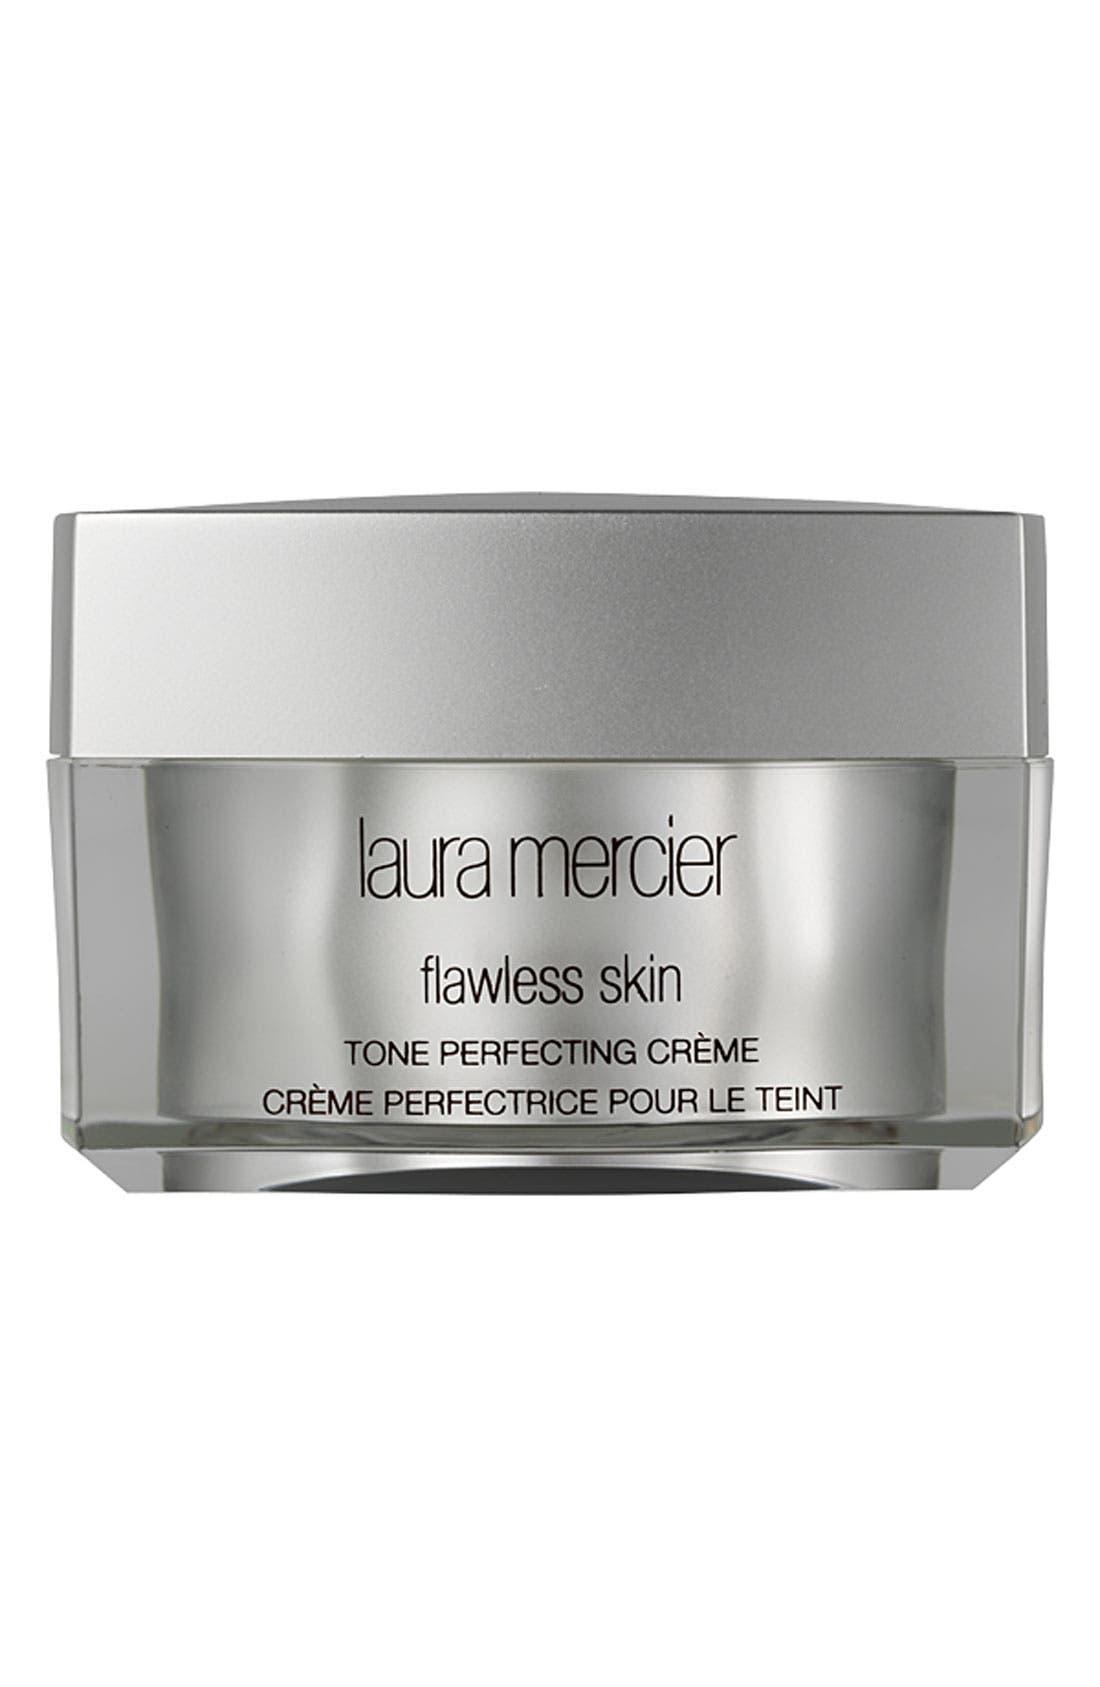 'Flawless Skin' Tone Perfecting Crème,                             Main thumbnail 1, color,                             000